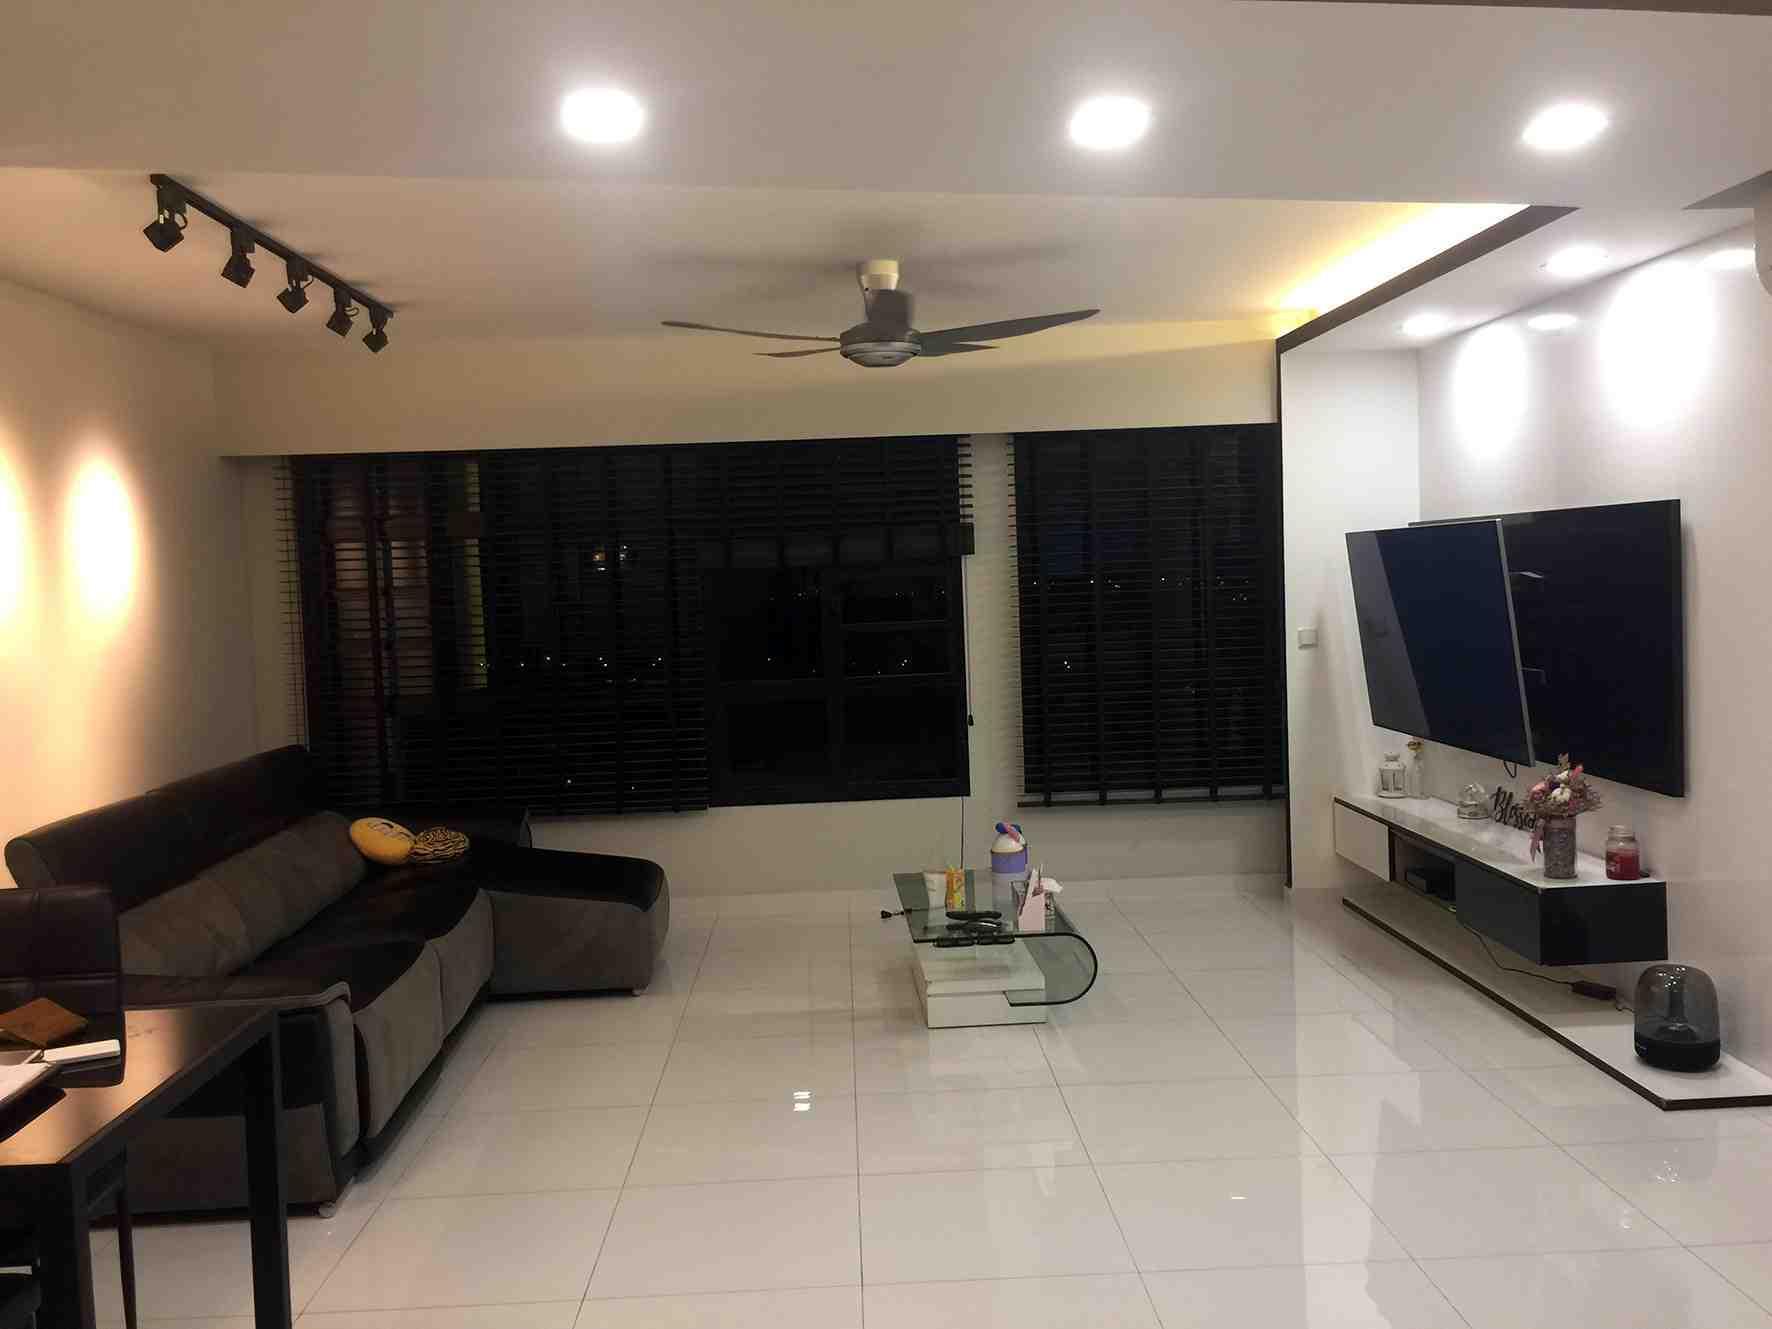 001 living room area 1